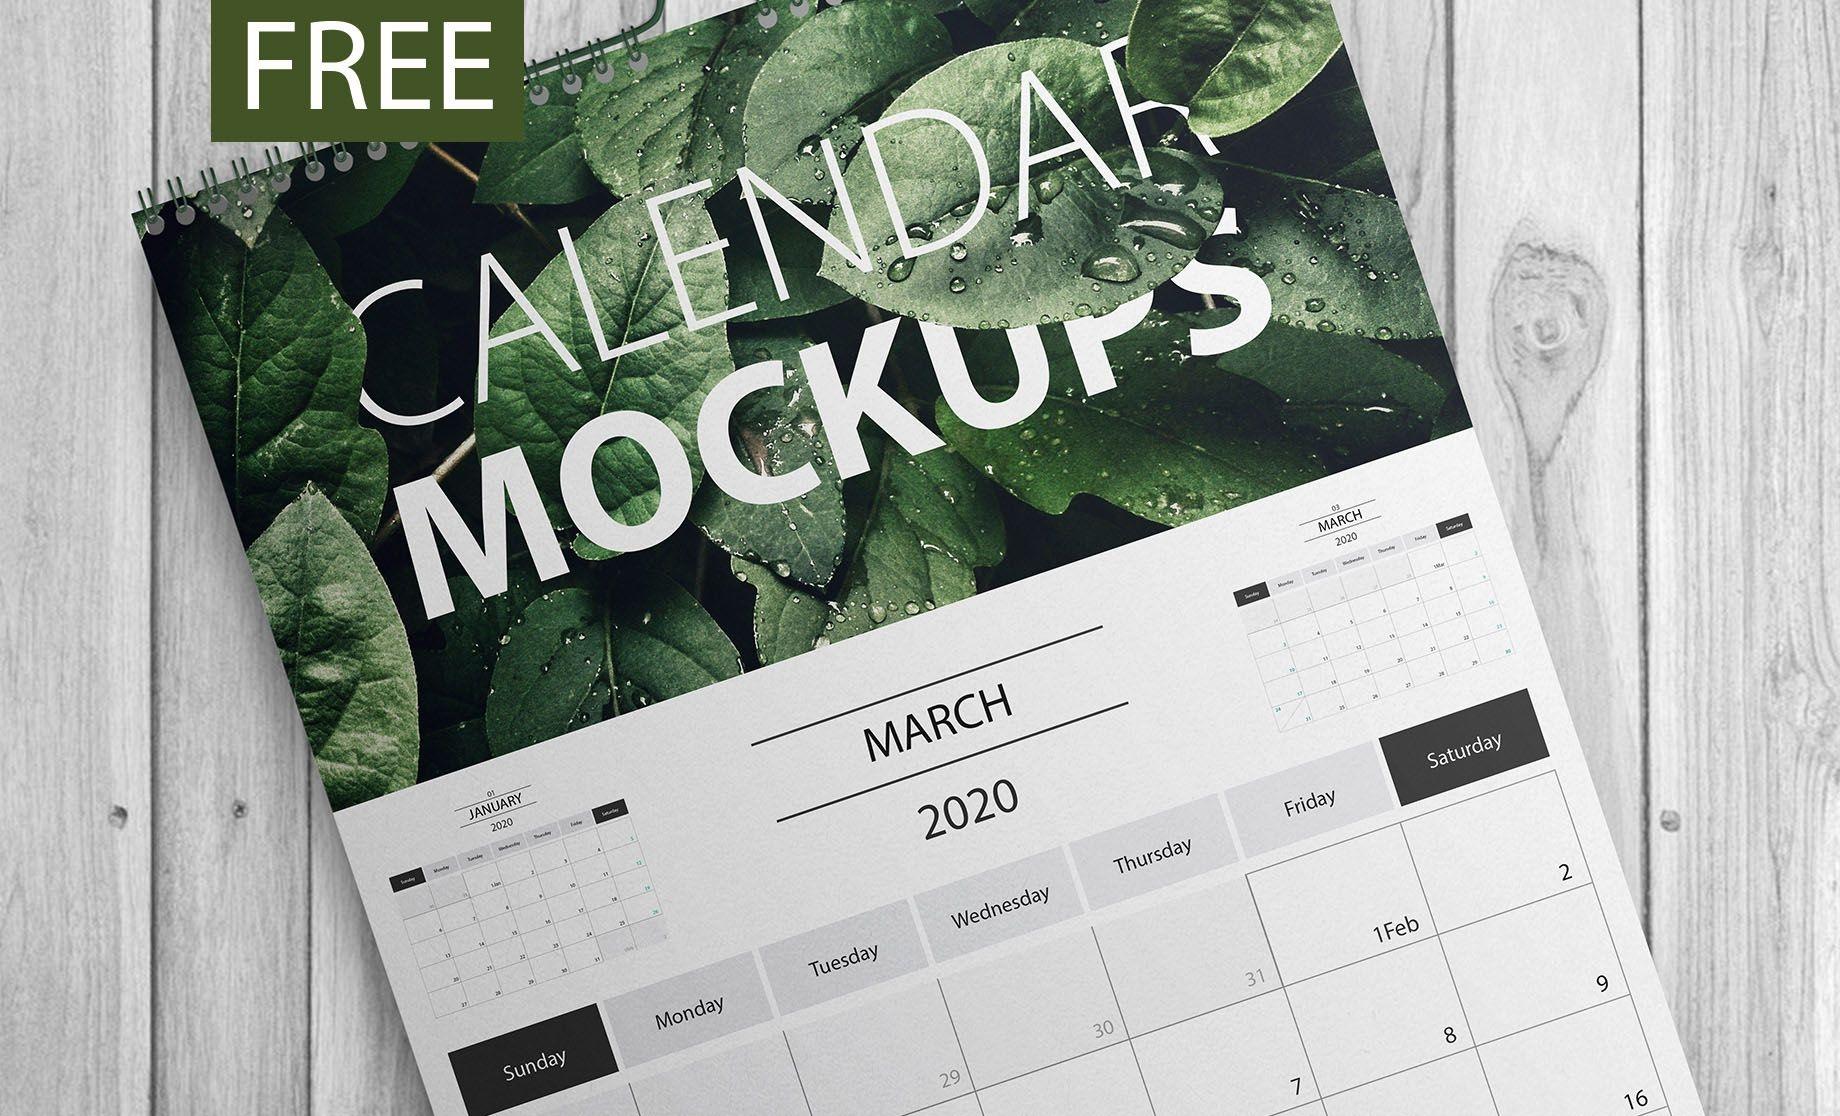 40 premium and free psd calendar templates & mockups to